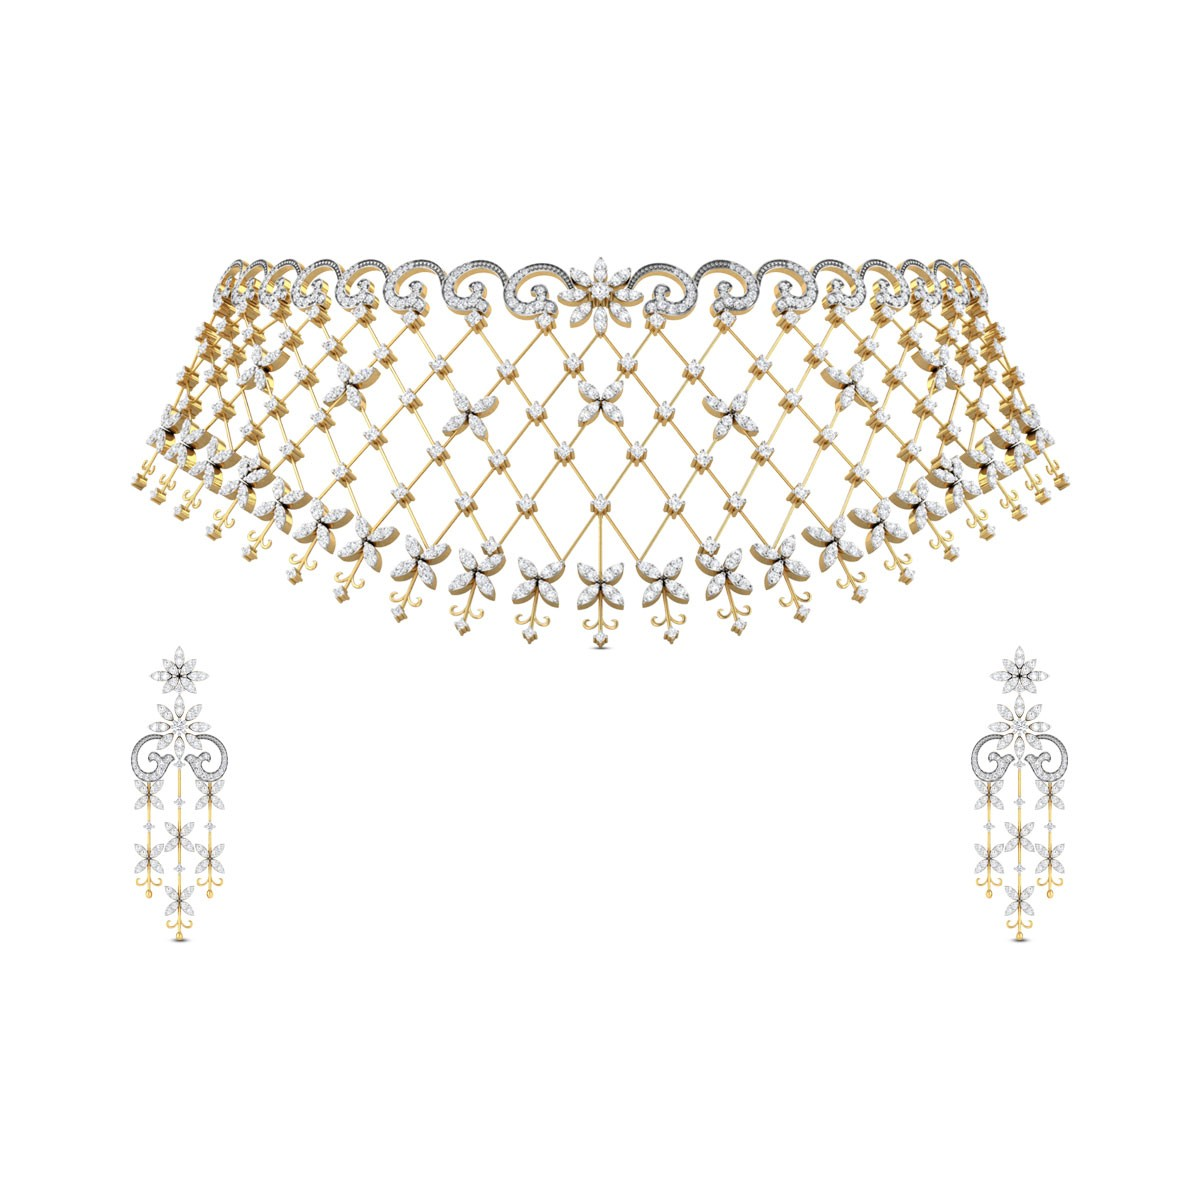 98157bc01eddfc Lekisha Floral Diamond Necklace Set